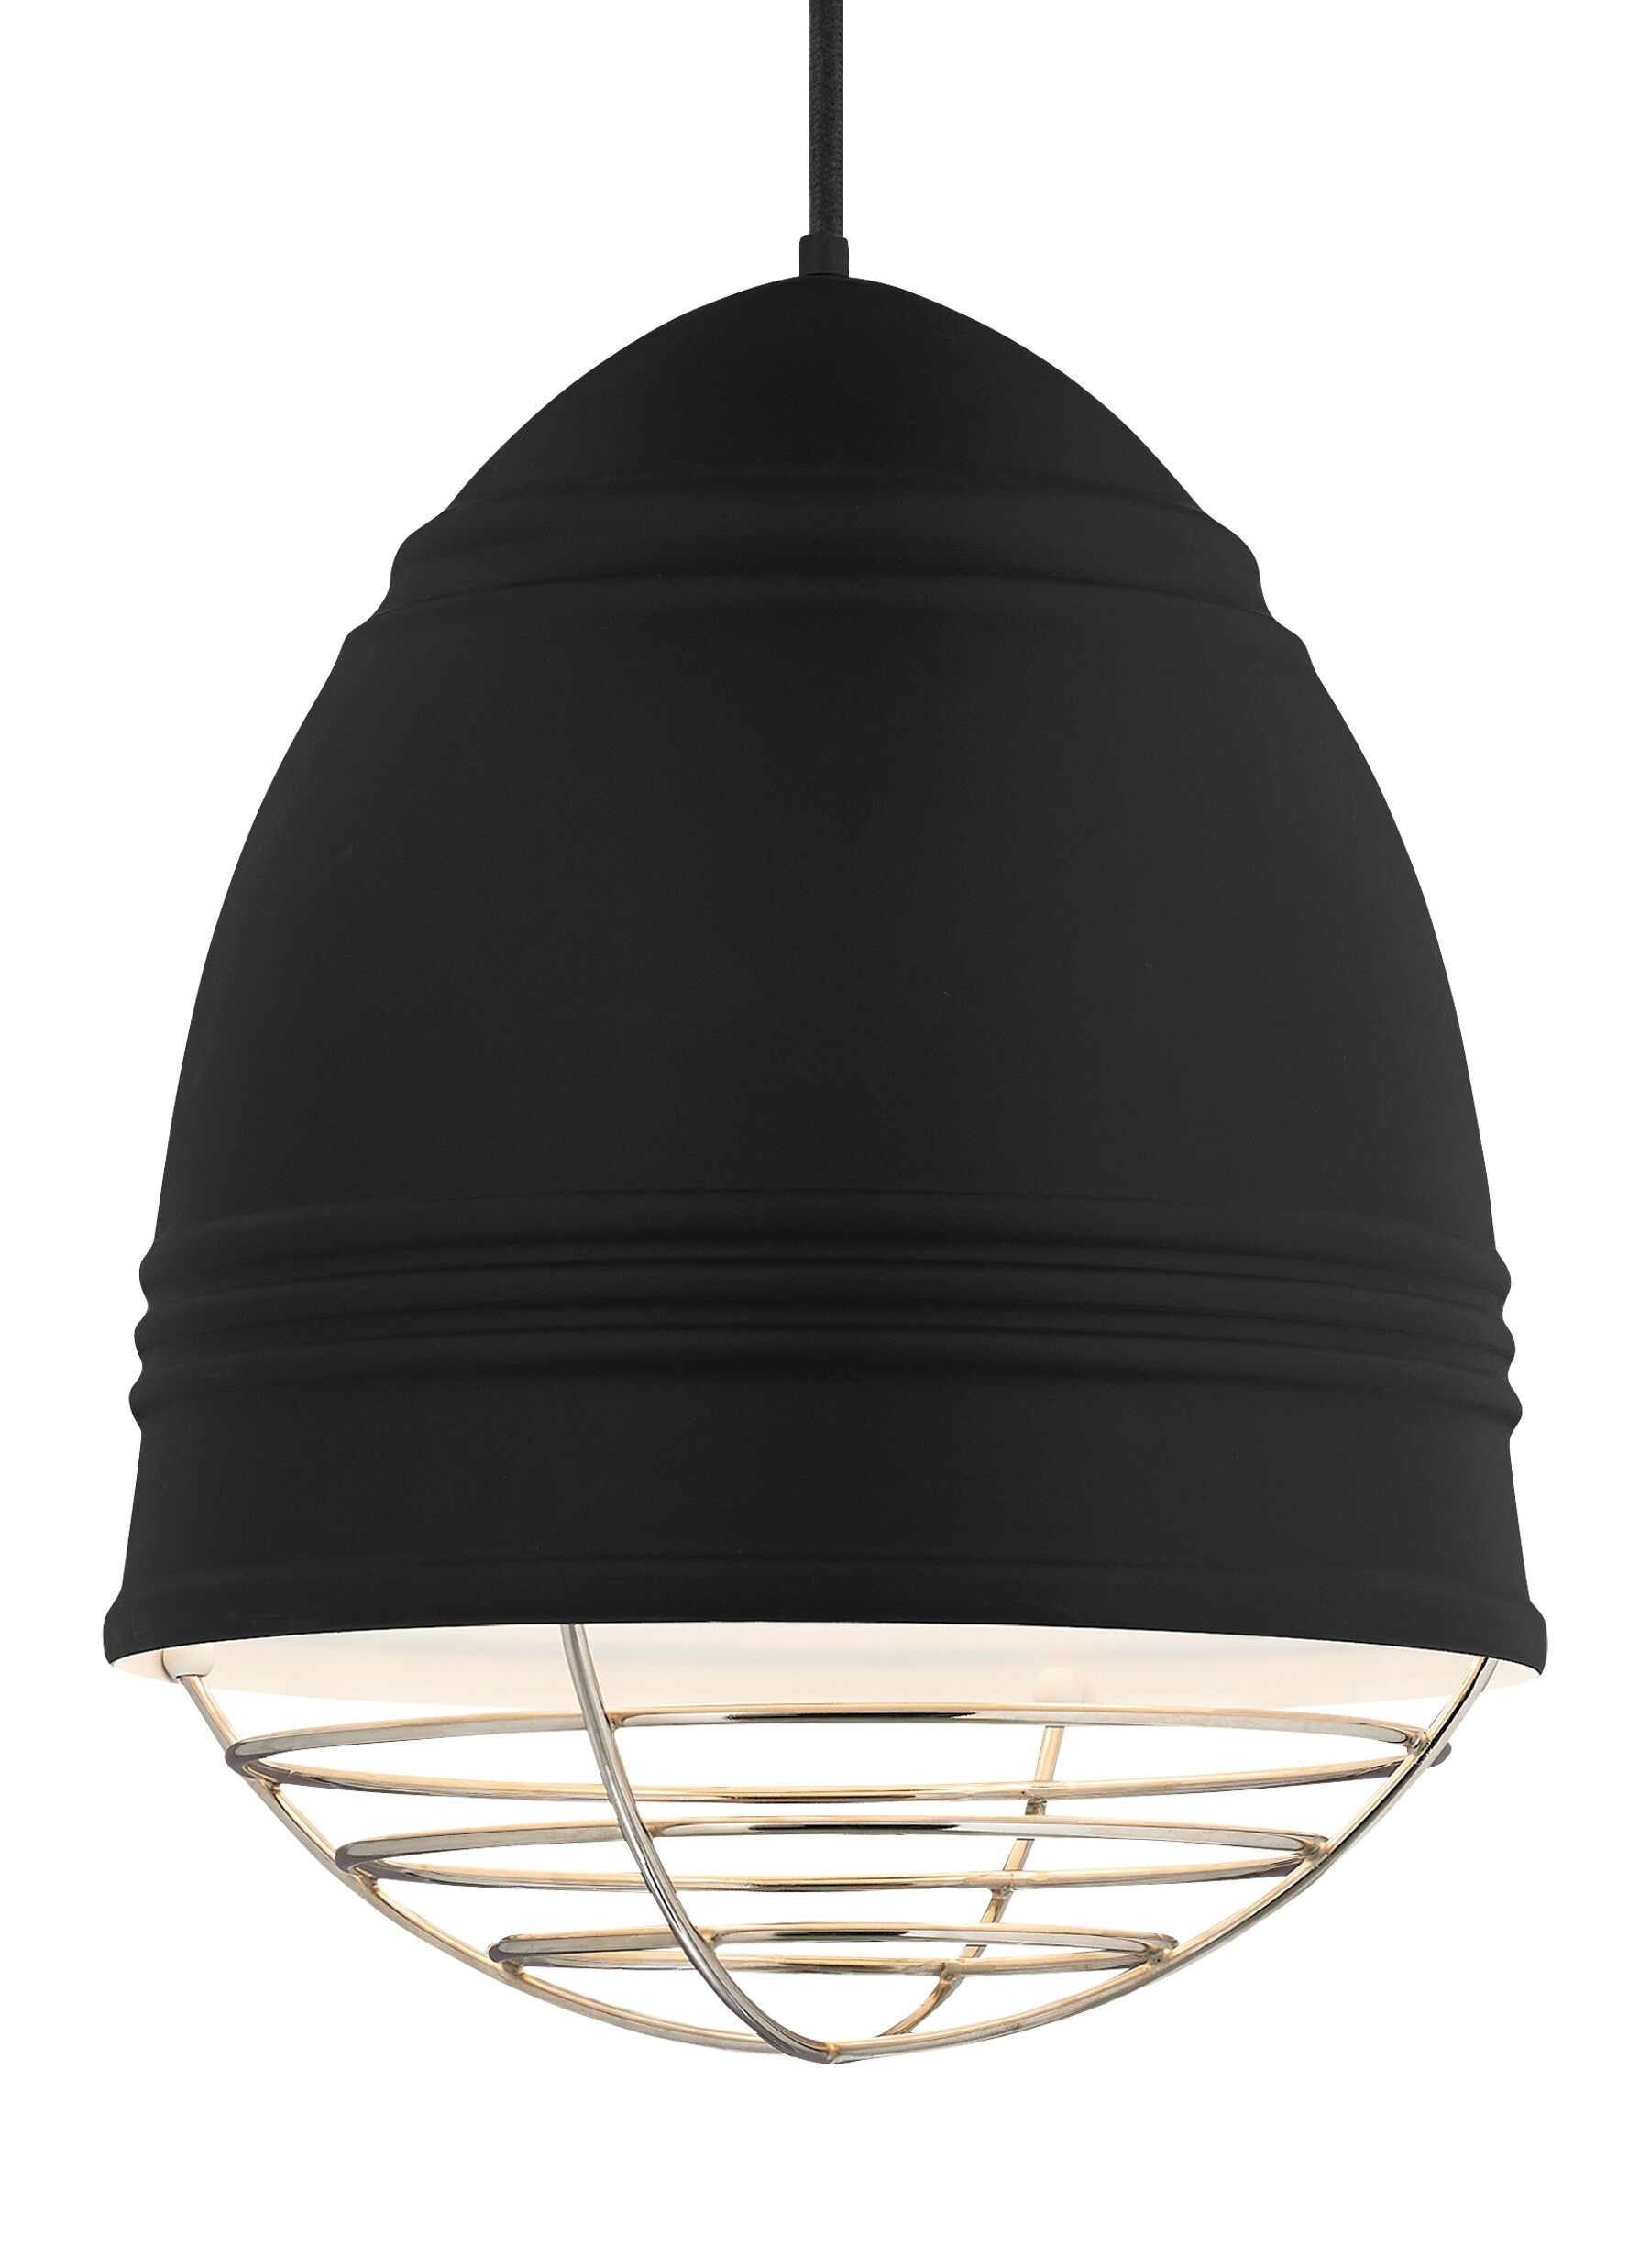 Else 3-Light Bell Pendant Finish: Polished Nickel, Shade Color: Rubberized Black/White Interior